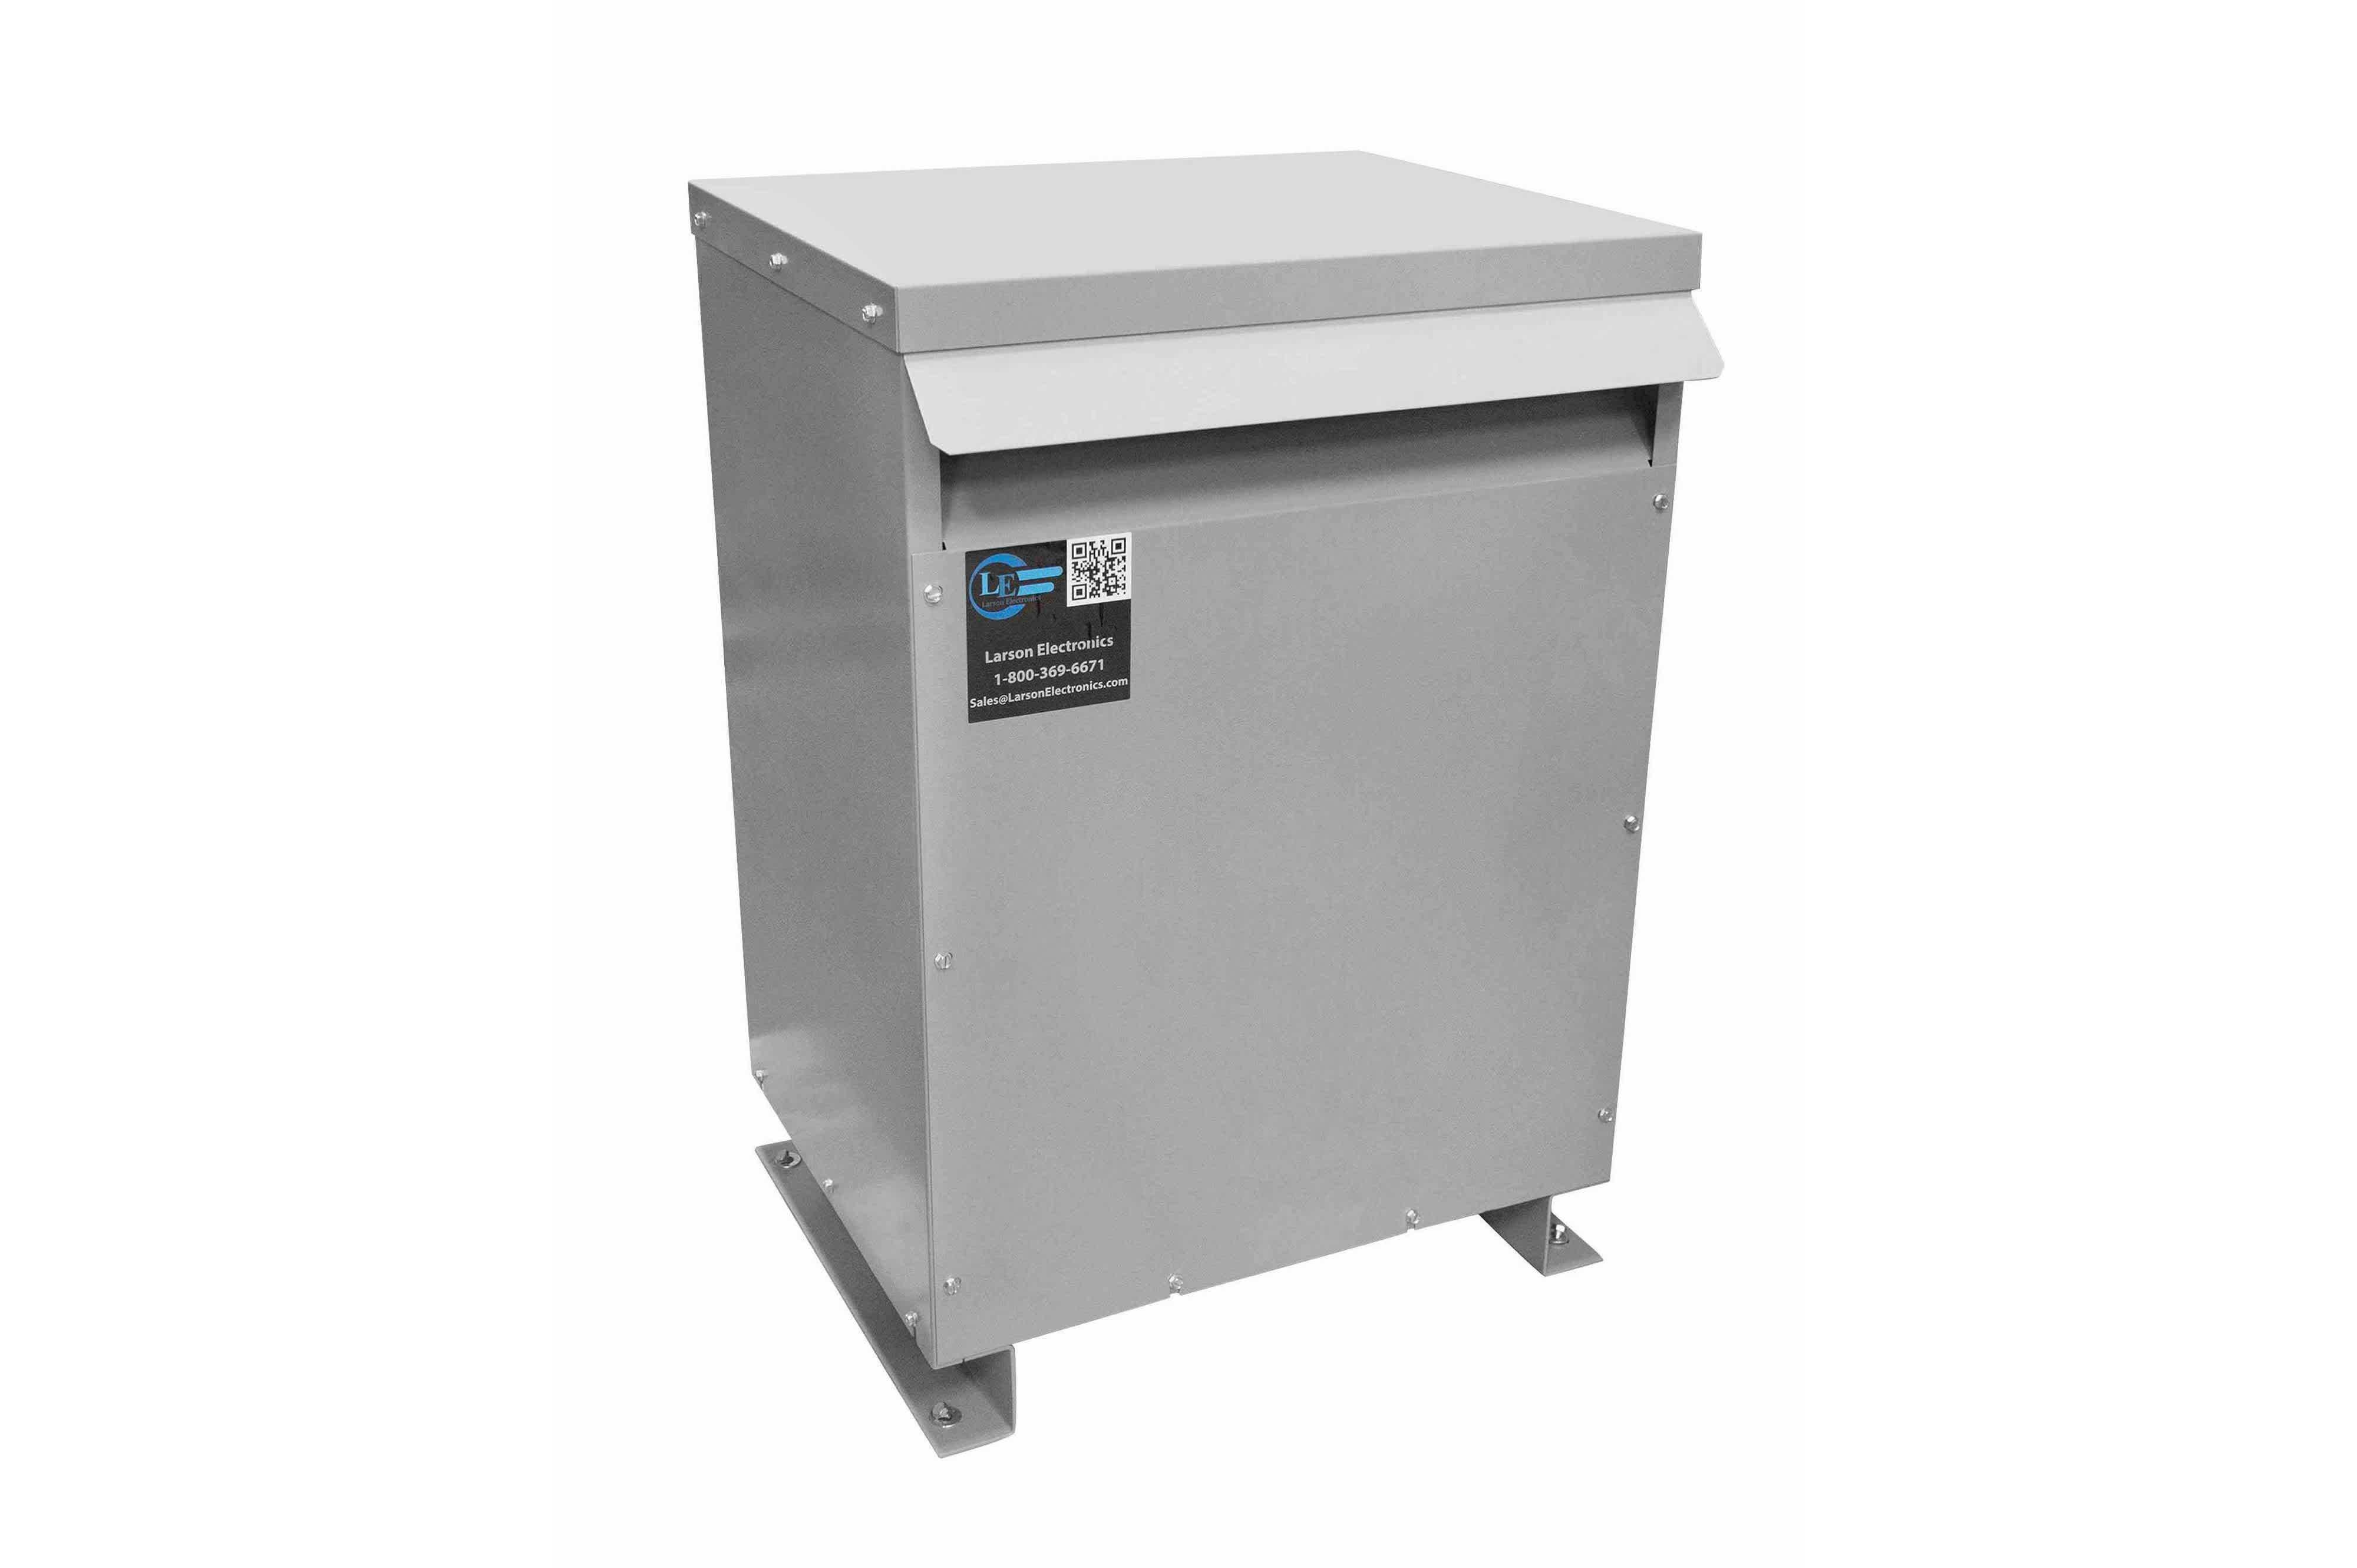 36 kVA 3PH Isolation Transformer, 600V Wye Primary, 208Y/120 Wye-N Secondary, N3R, Ventilated, 60 Hz